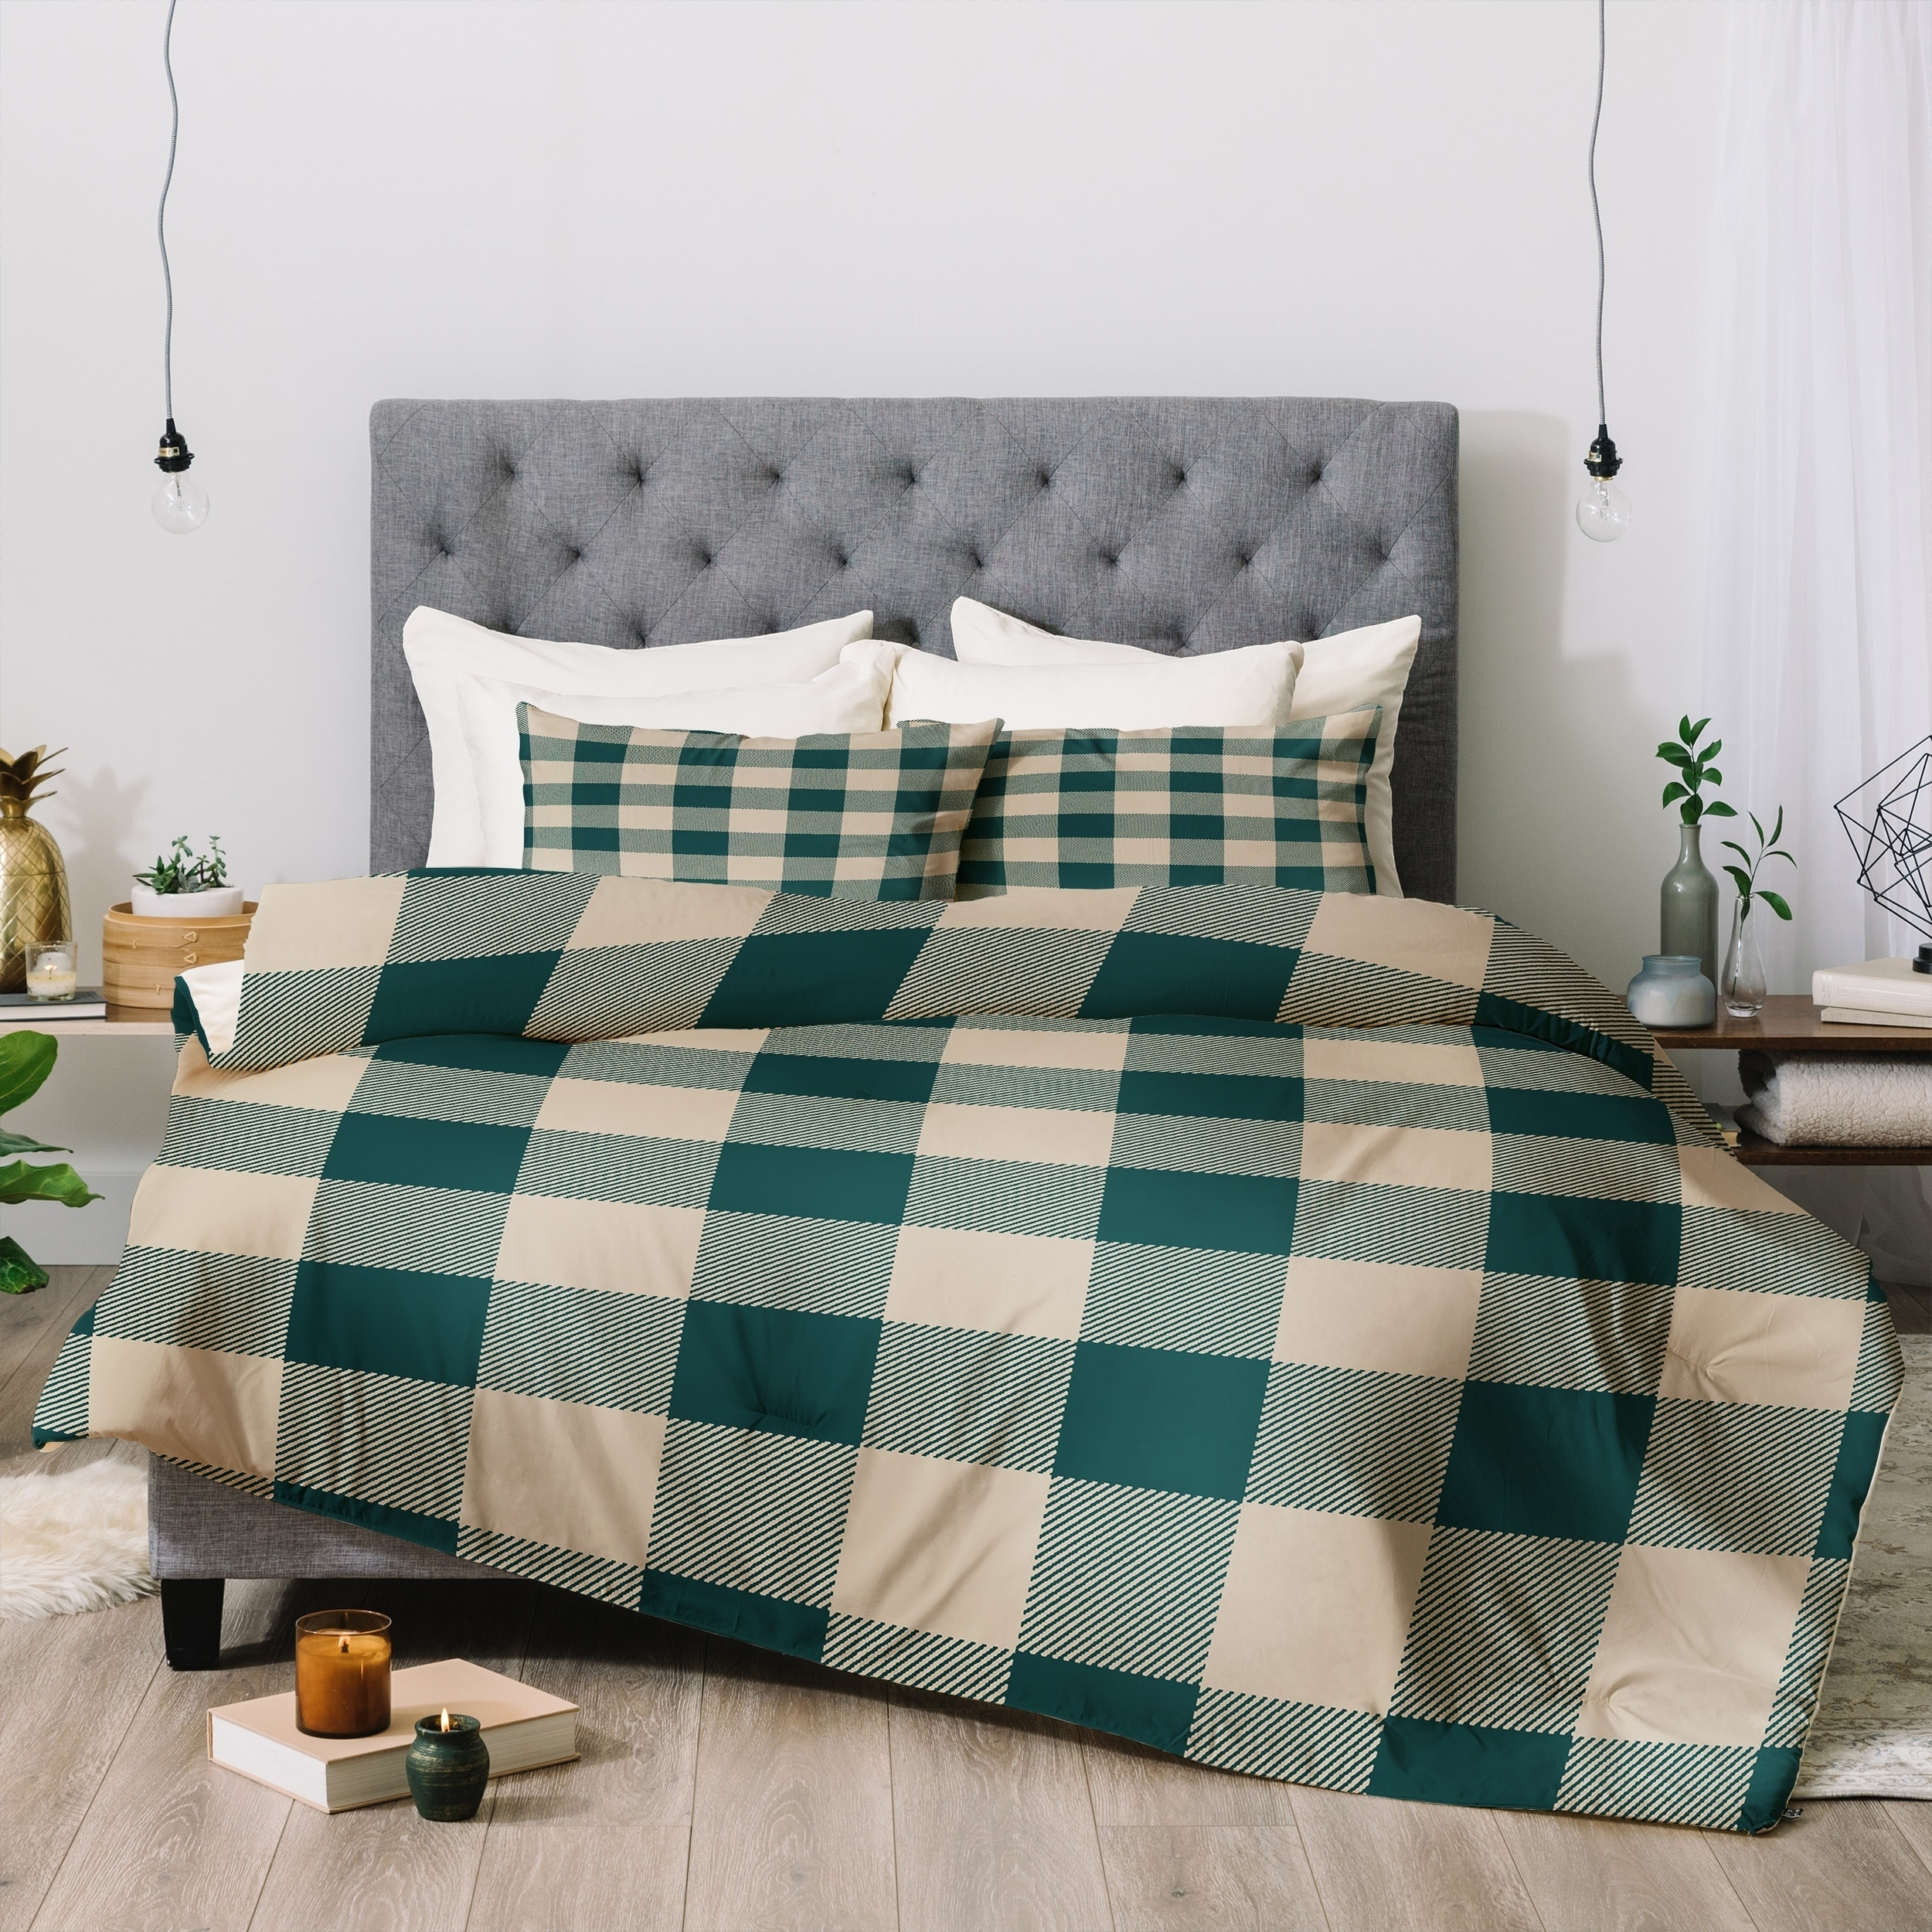 for sets fashions home classic comforter a breezy piece sl bedding cotton twin cover purple set duvet king student plaid